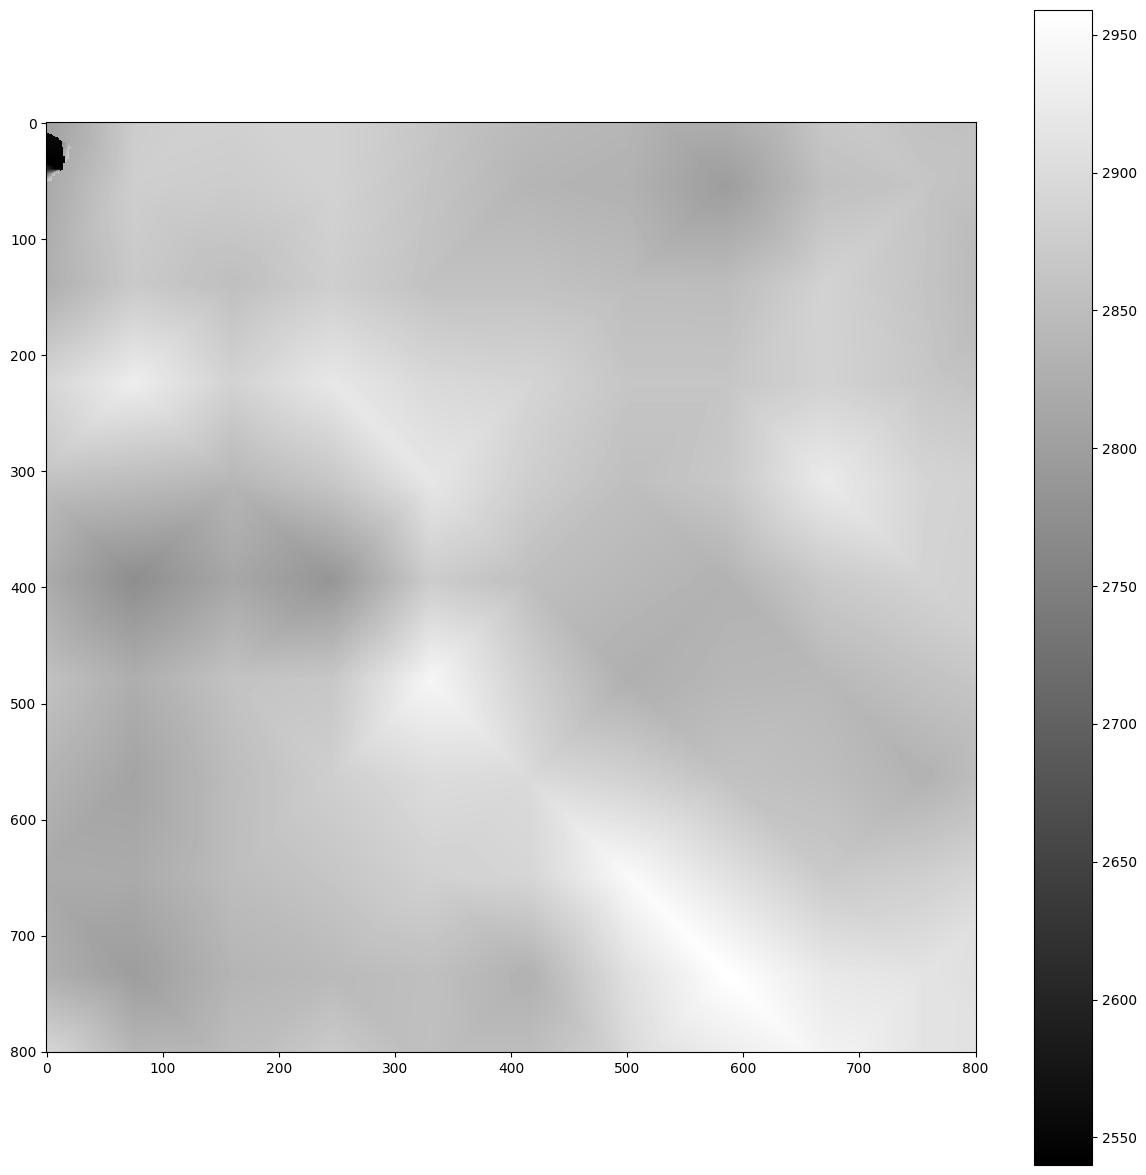 bench/seismic/wp/la_habra/meshes/velocity_model/plots/rho_10000.png